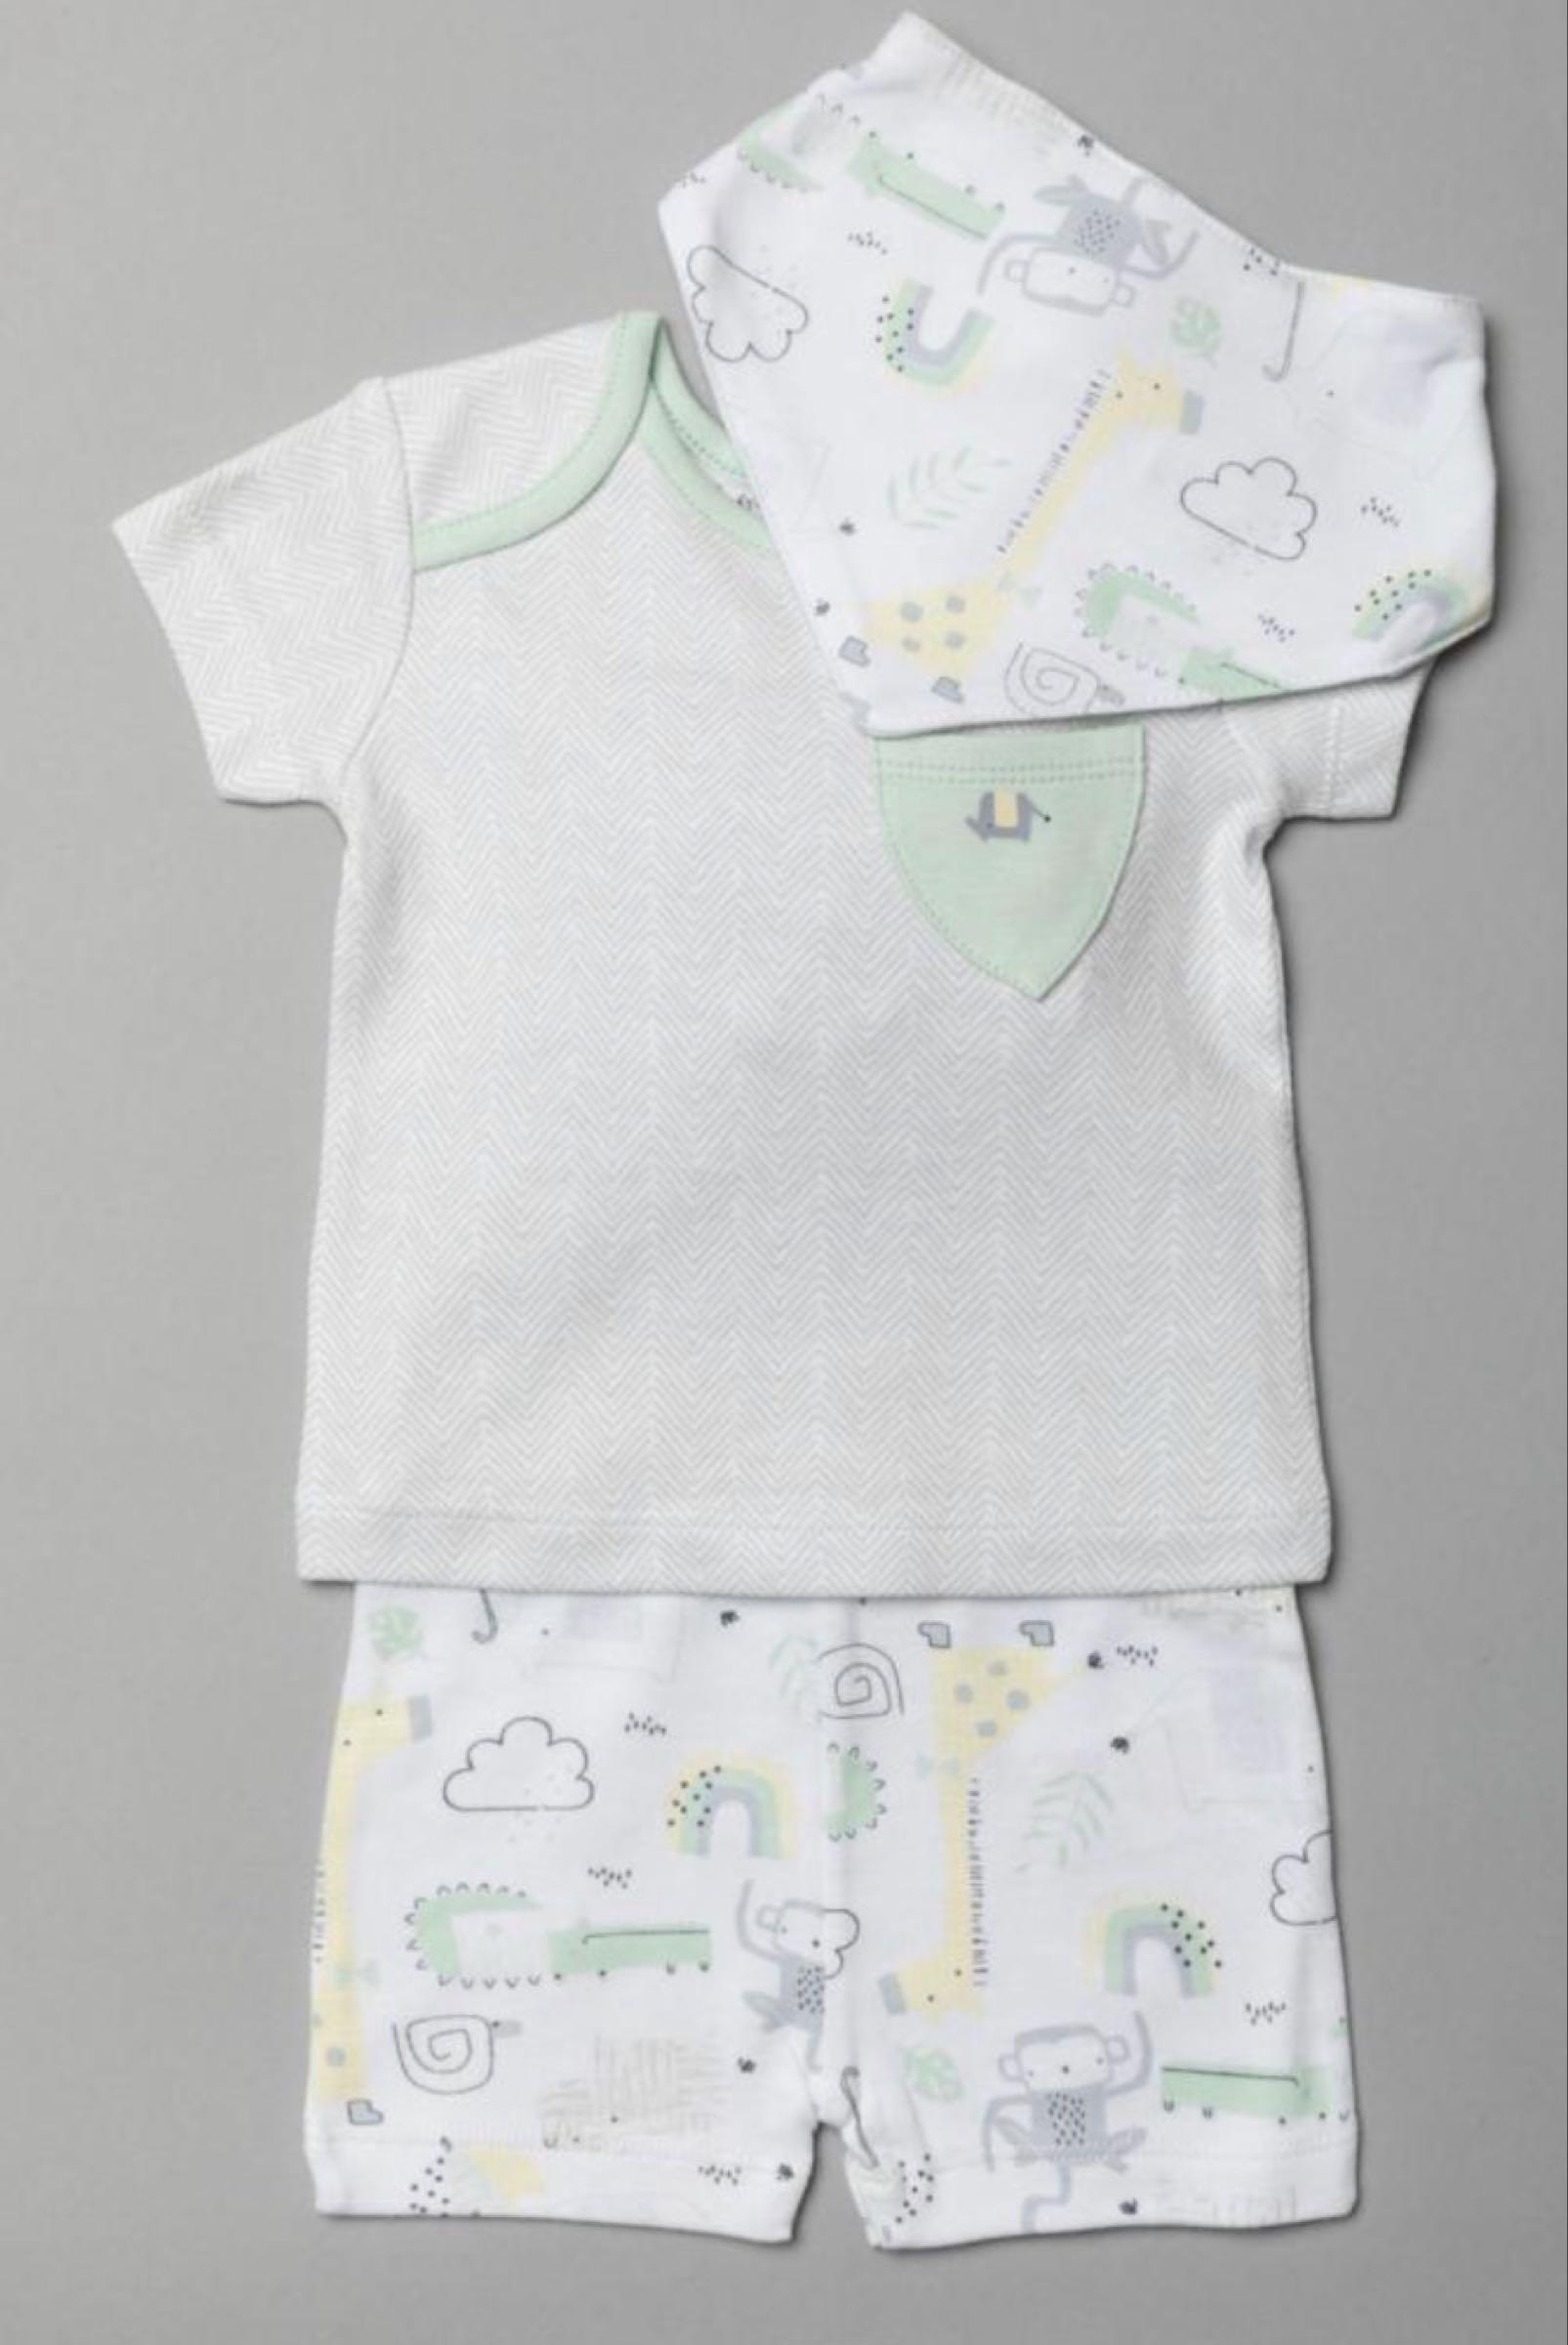 Organic unisex shorts and top set with bib